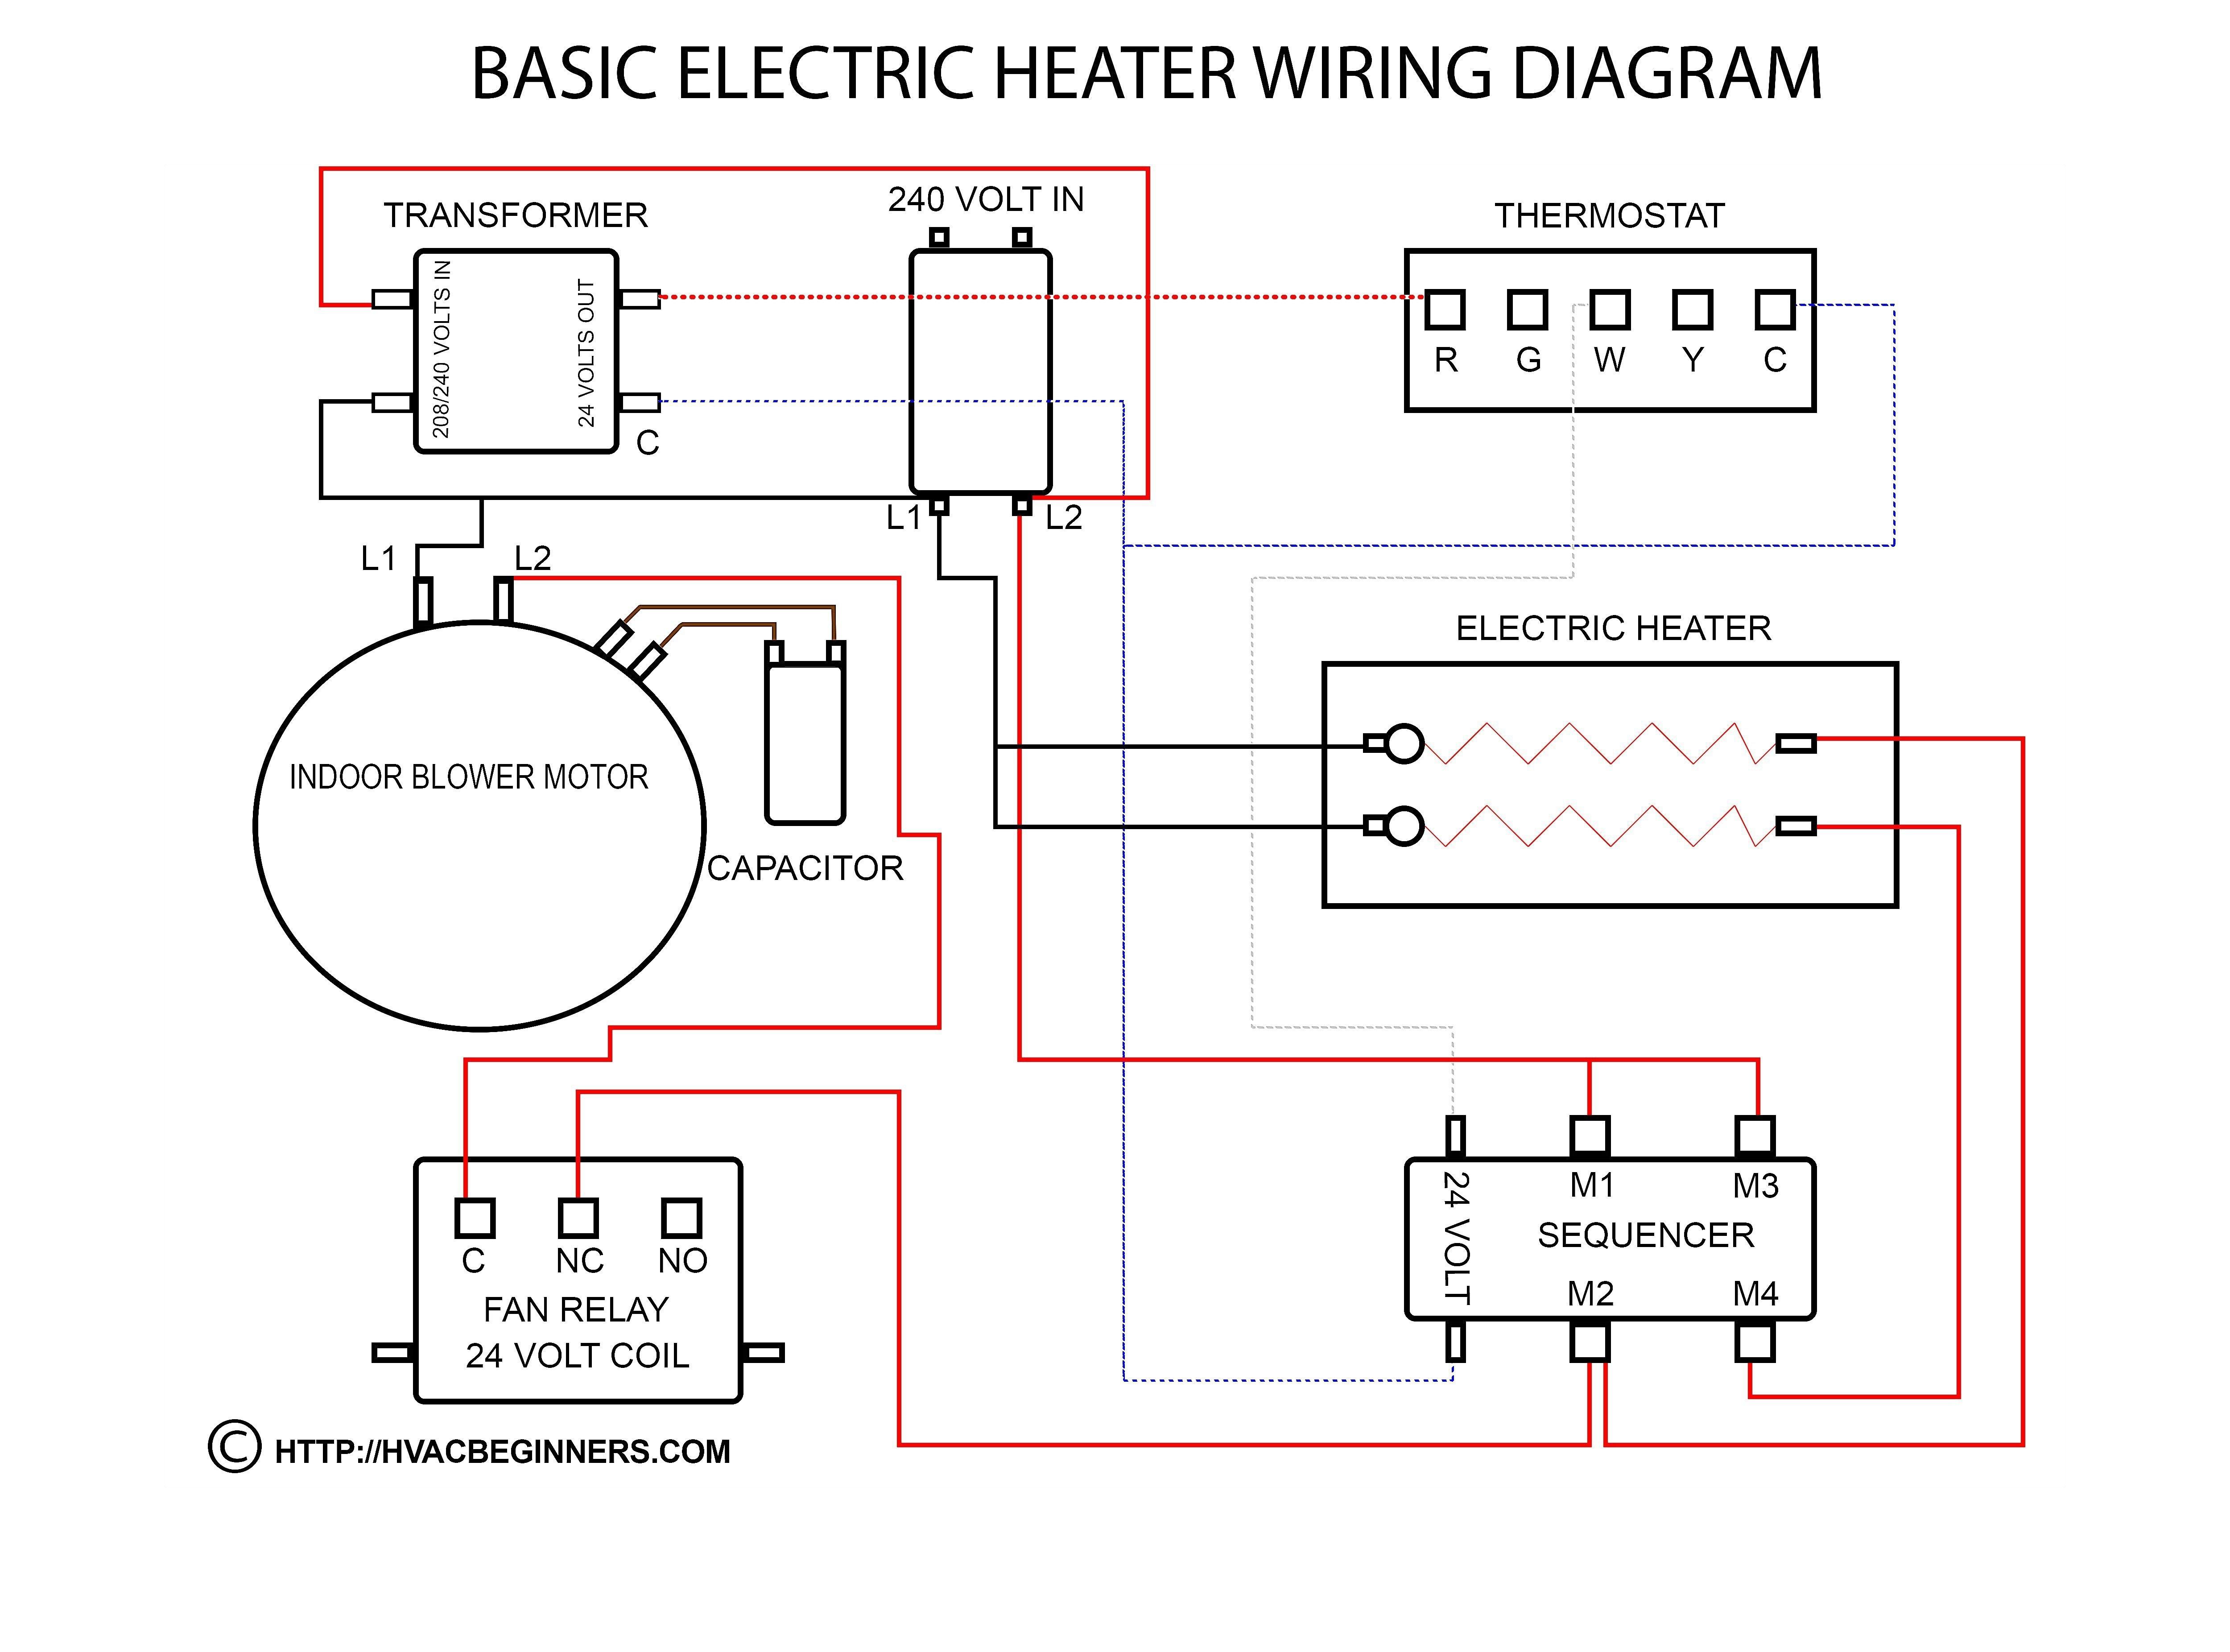 2001 Oldsmobile Aurora Engine Diagram Powerpoint Wiring Diagram Another Blog About Wiring Diagram • Of 2001 Oldsmobile Aurora Engine Diagram